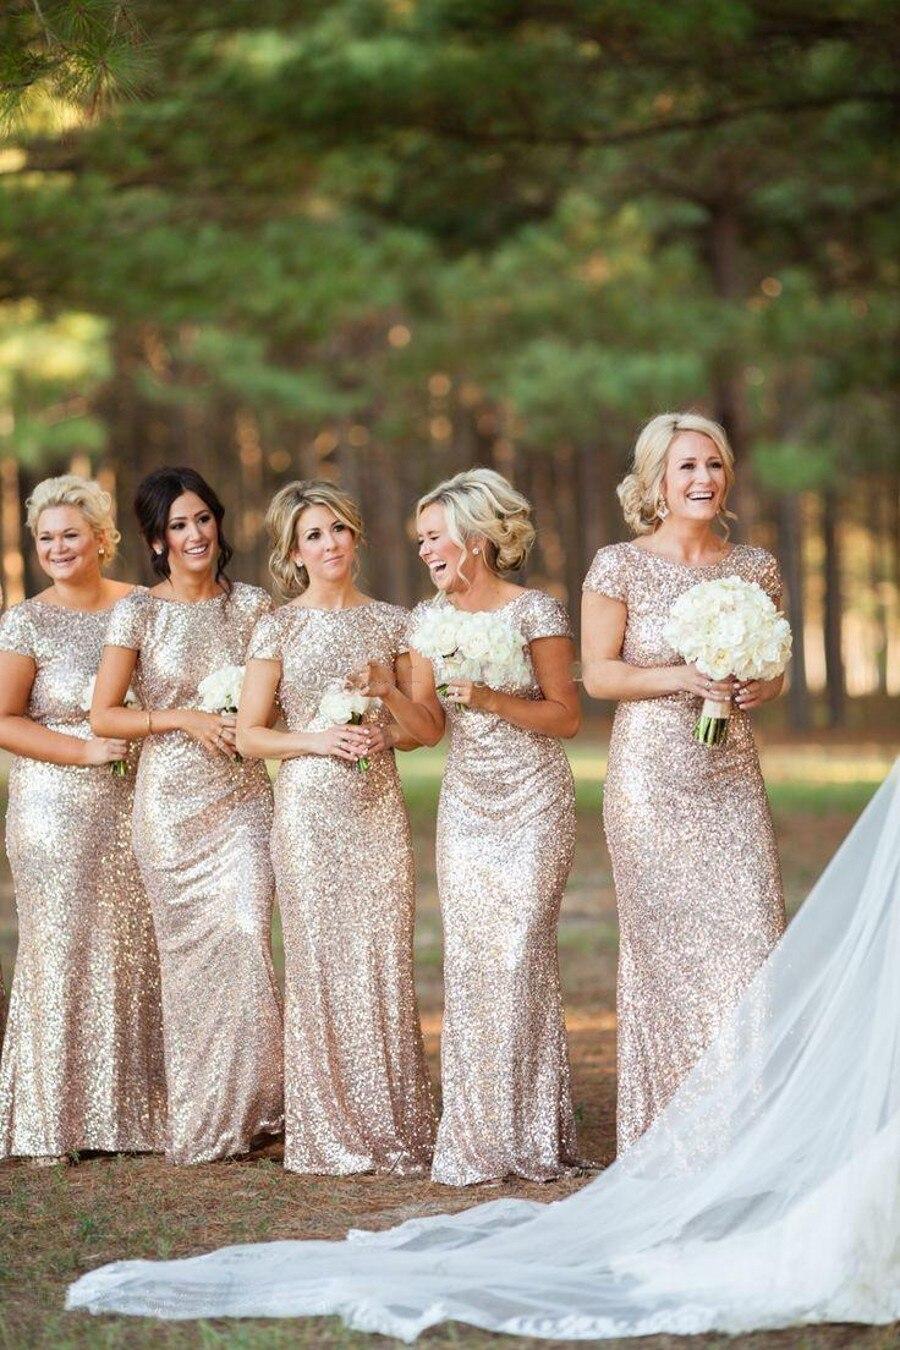 Christmas Bridal Dresses | Dress images